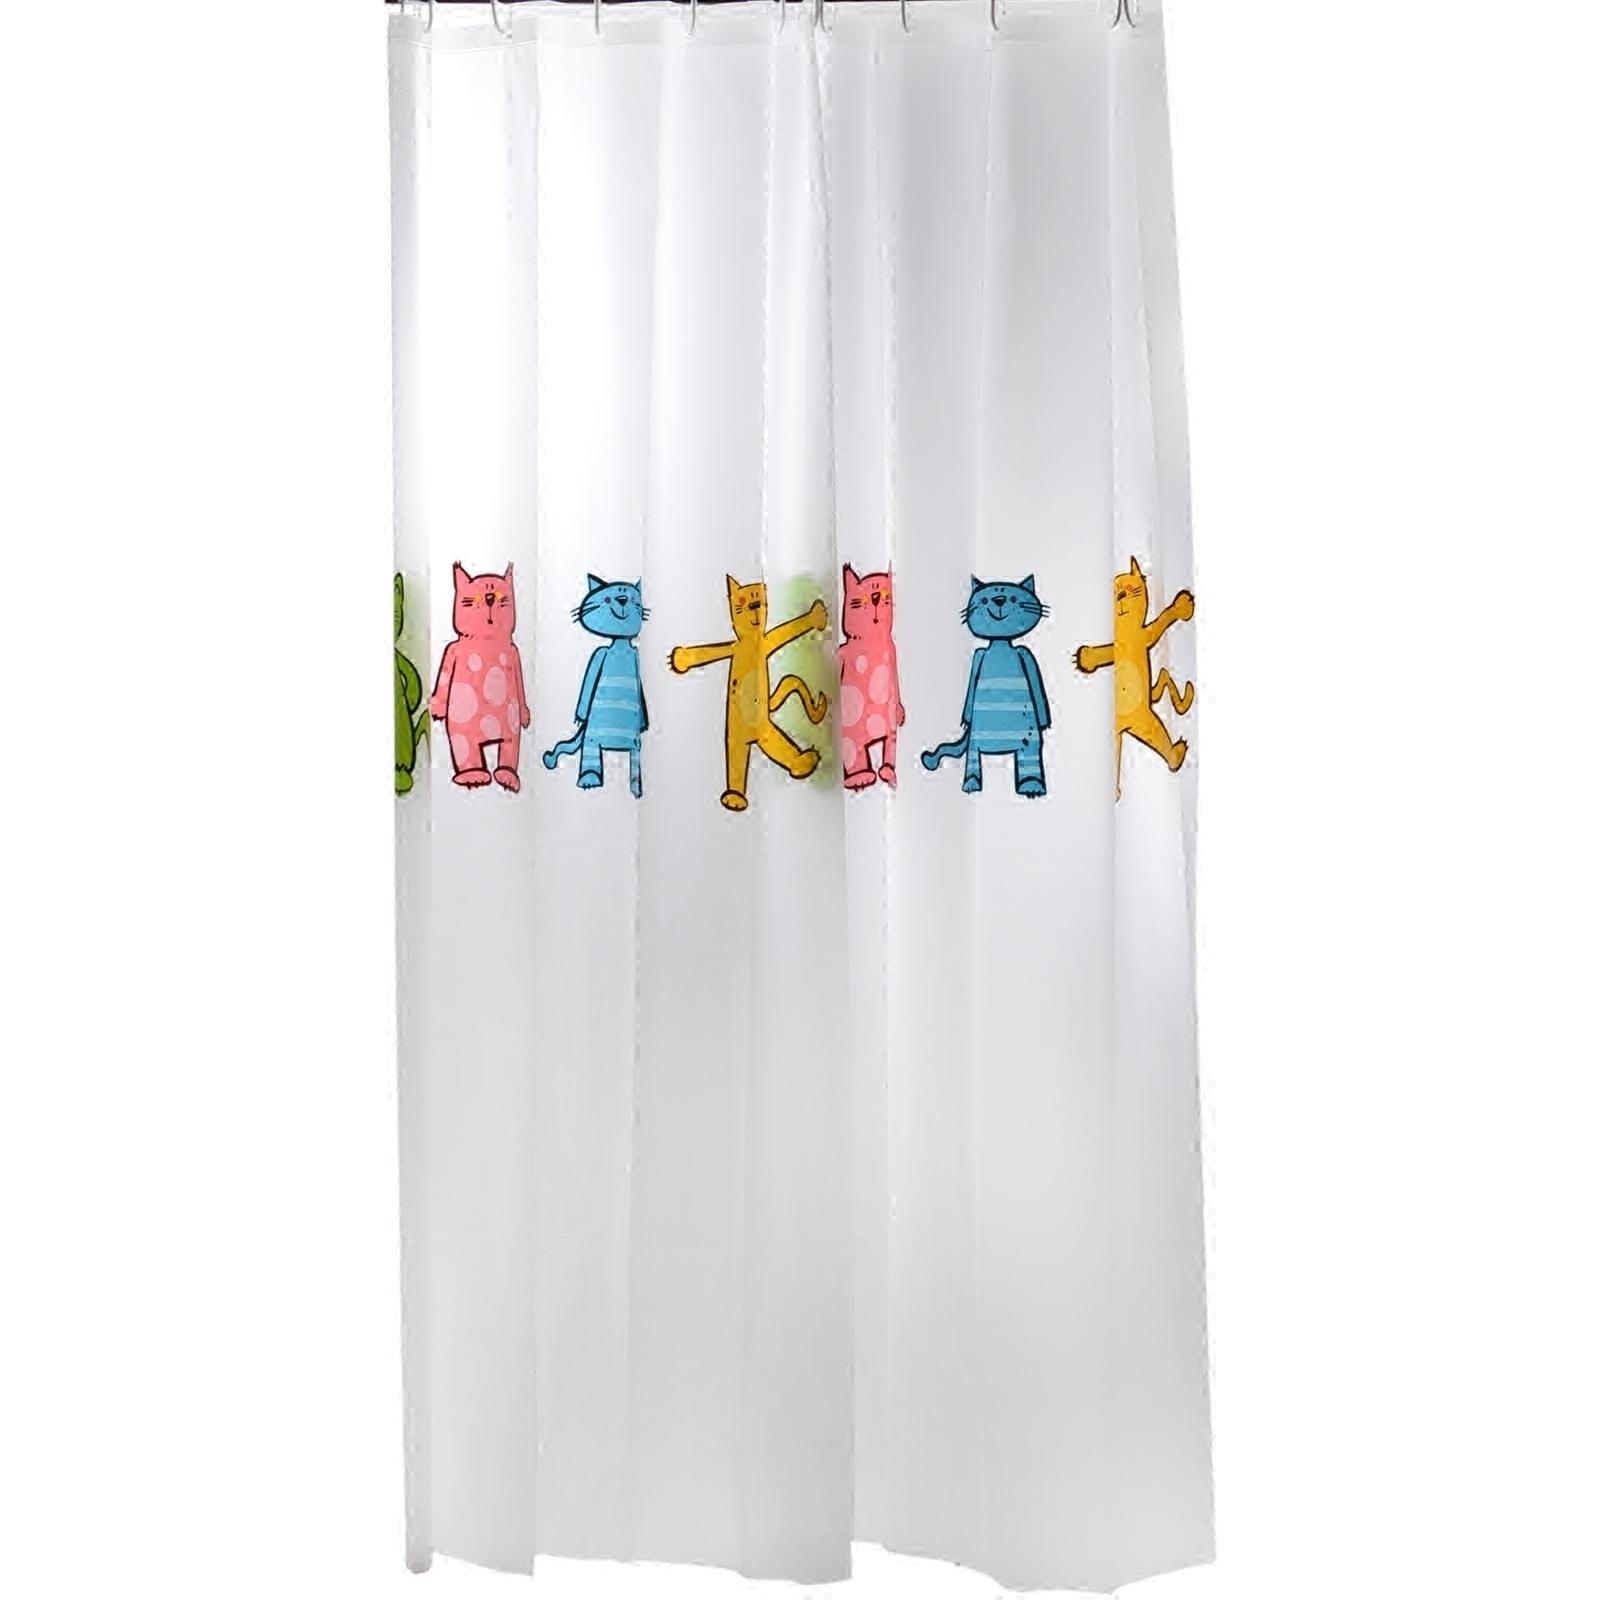 SPIRELLA/丝普瑞简约卡通机器猫PEVA加厚塑料防水浴帘浴室隔断帘